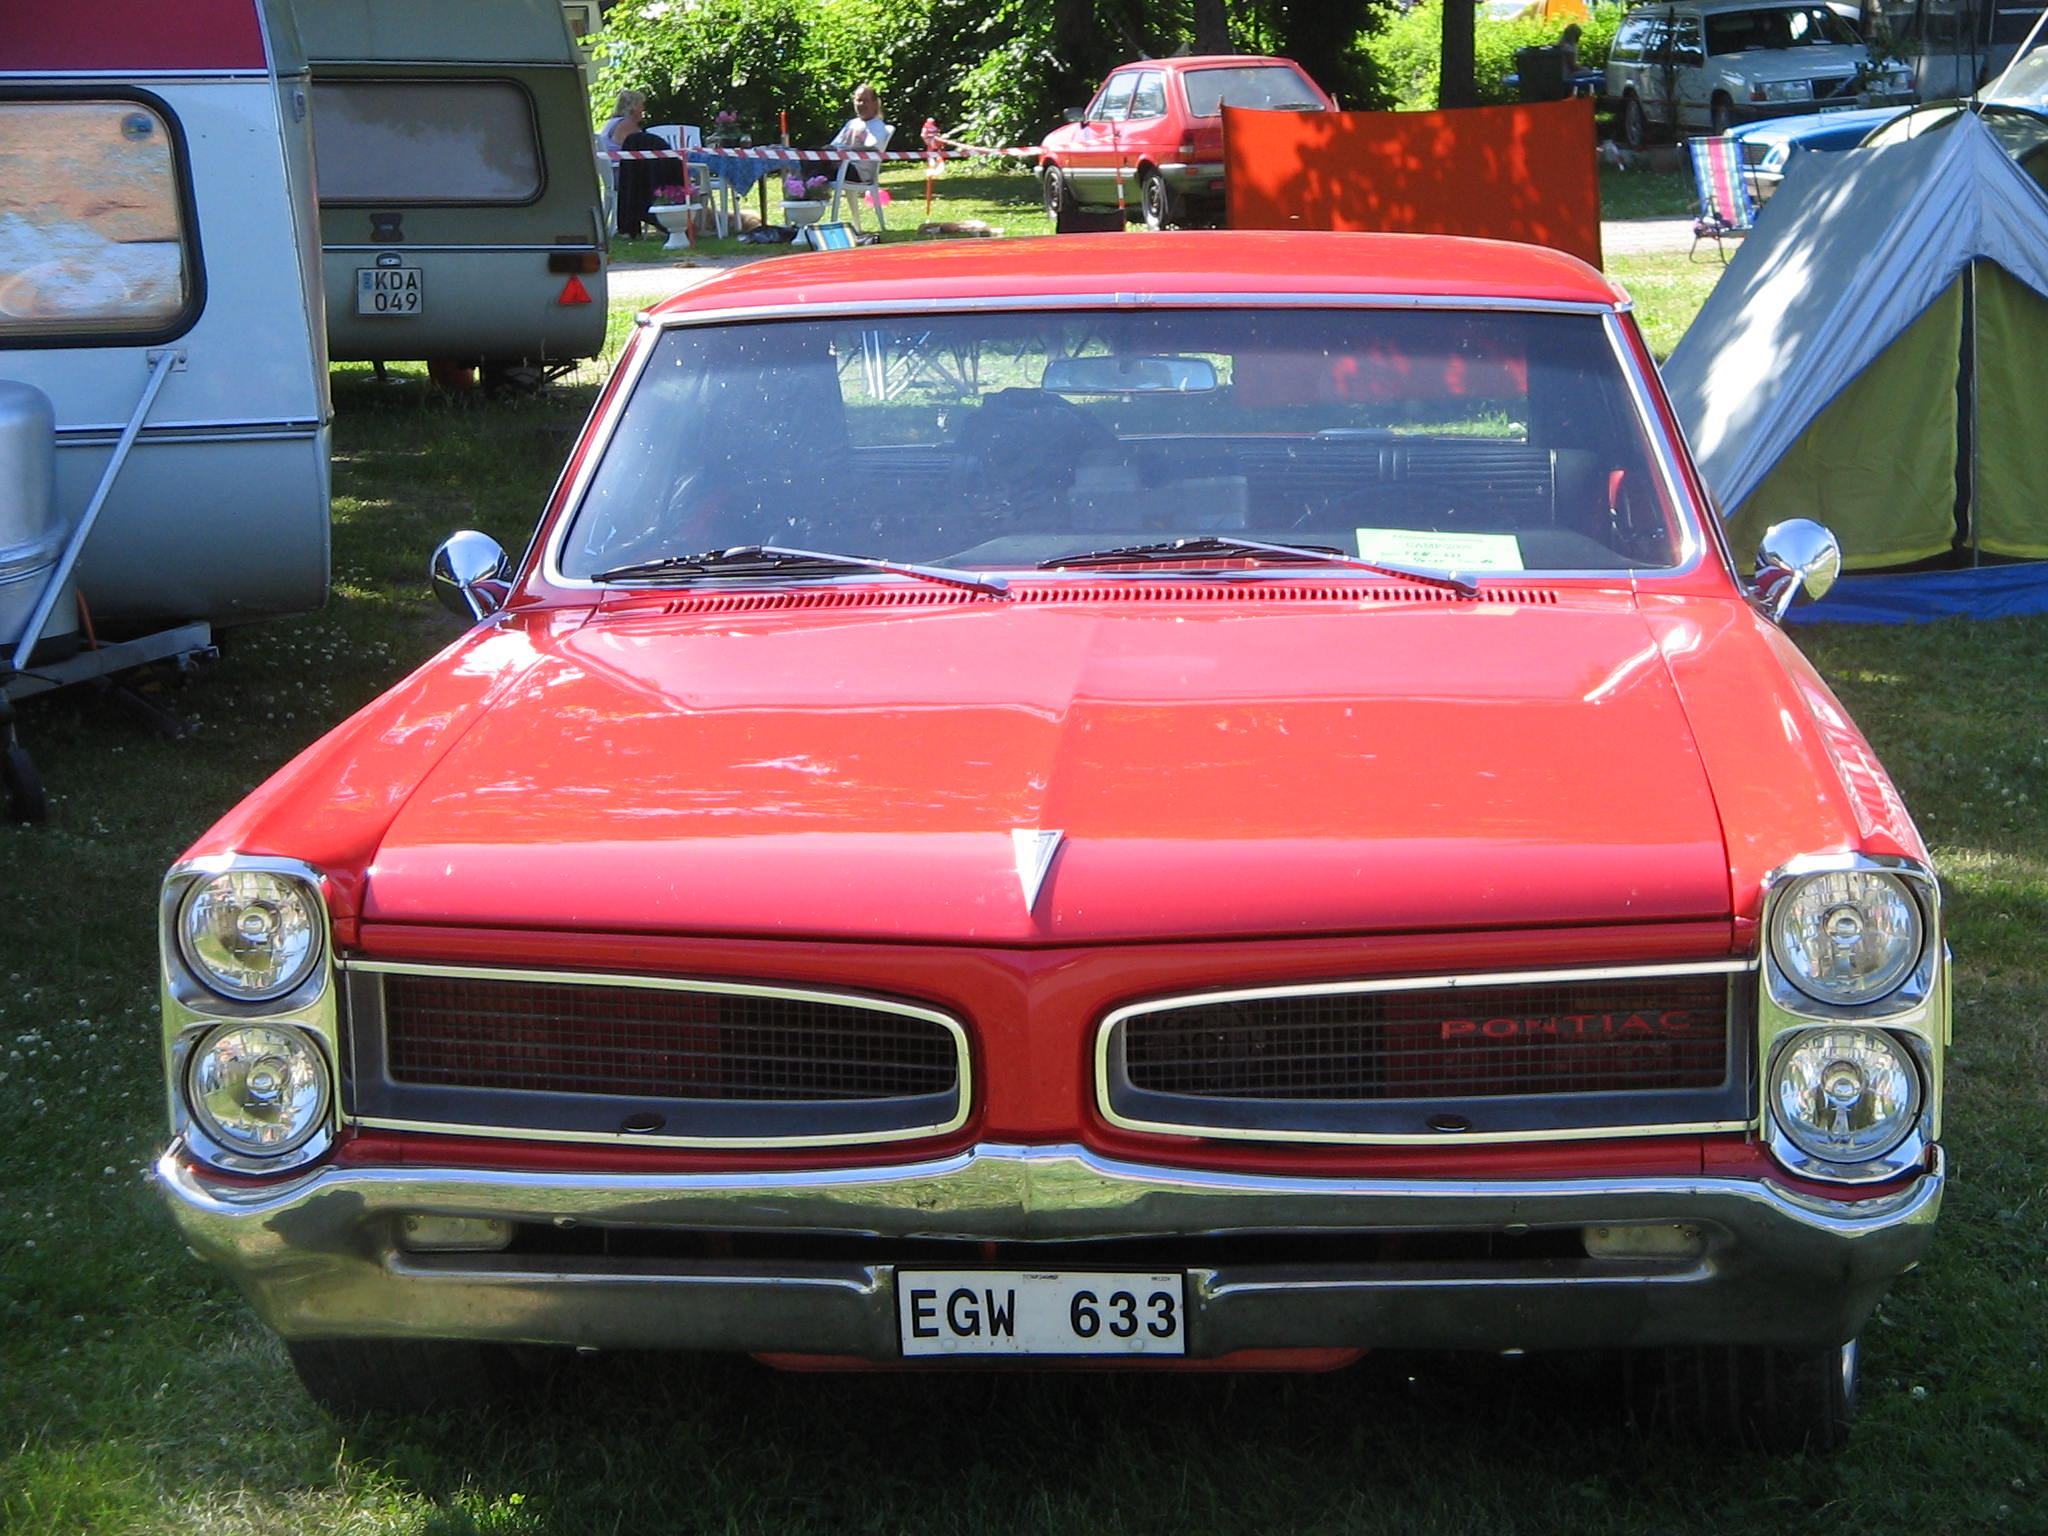 File:Red Pontiac at Power Big Meet 2005.jpg - Wikimedia Commons